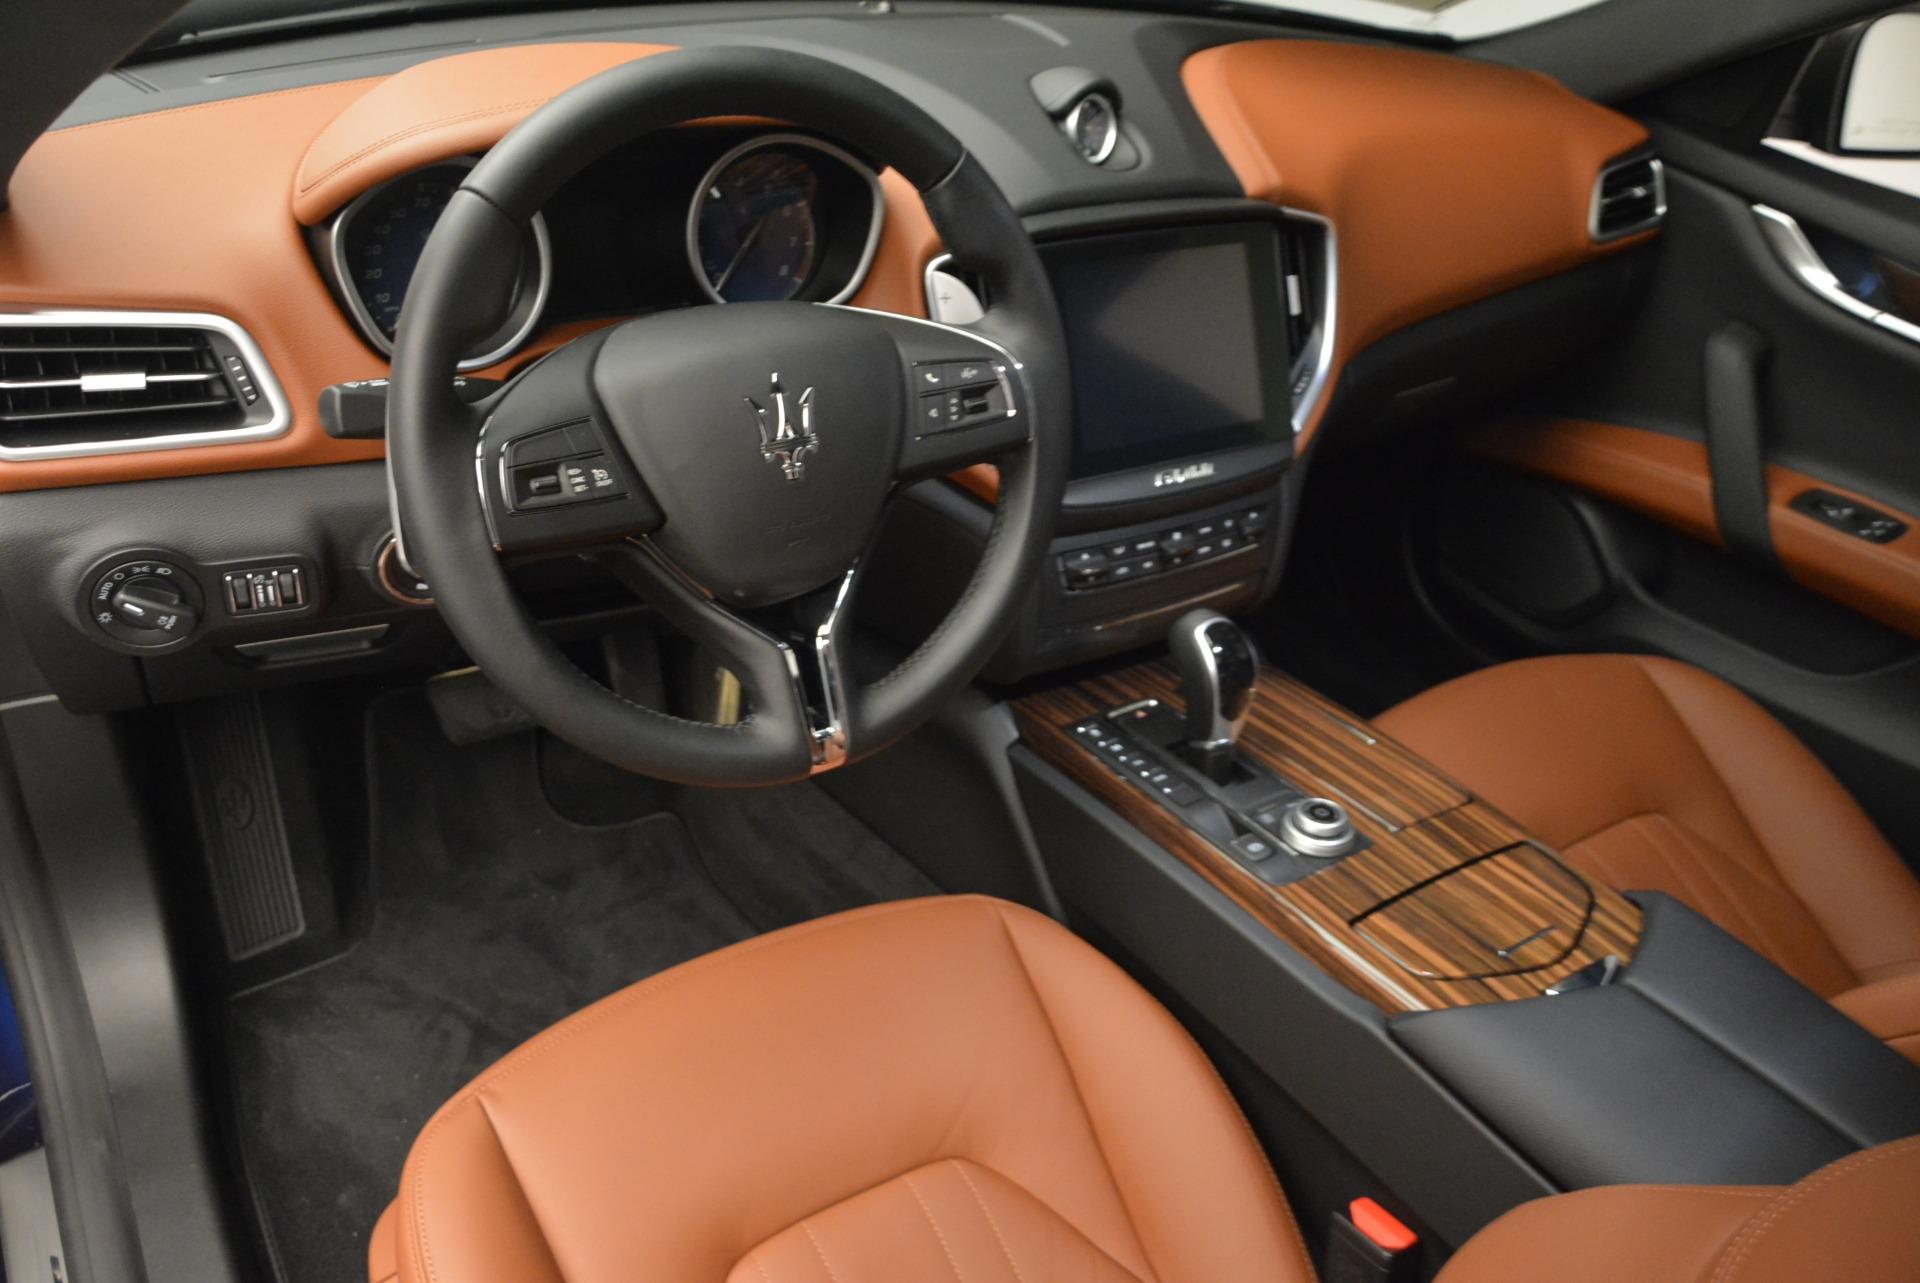 Used 2017 Maserati Ghibli S Q4 EX-LOANER For Sale In Westport, CT 608_p16